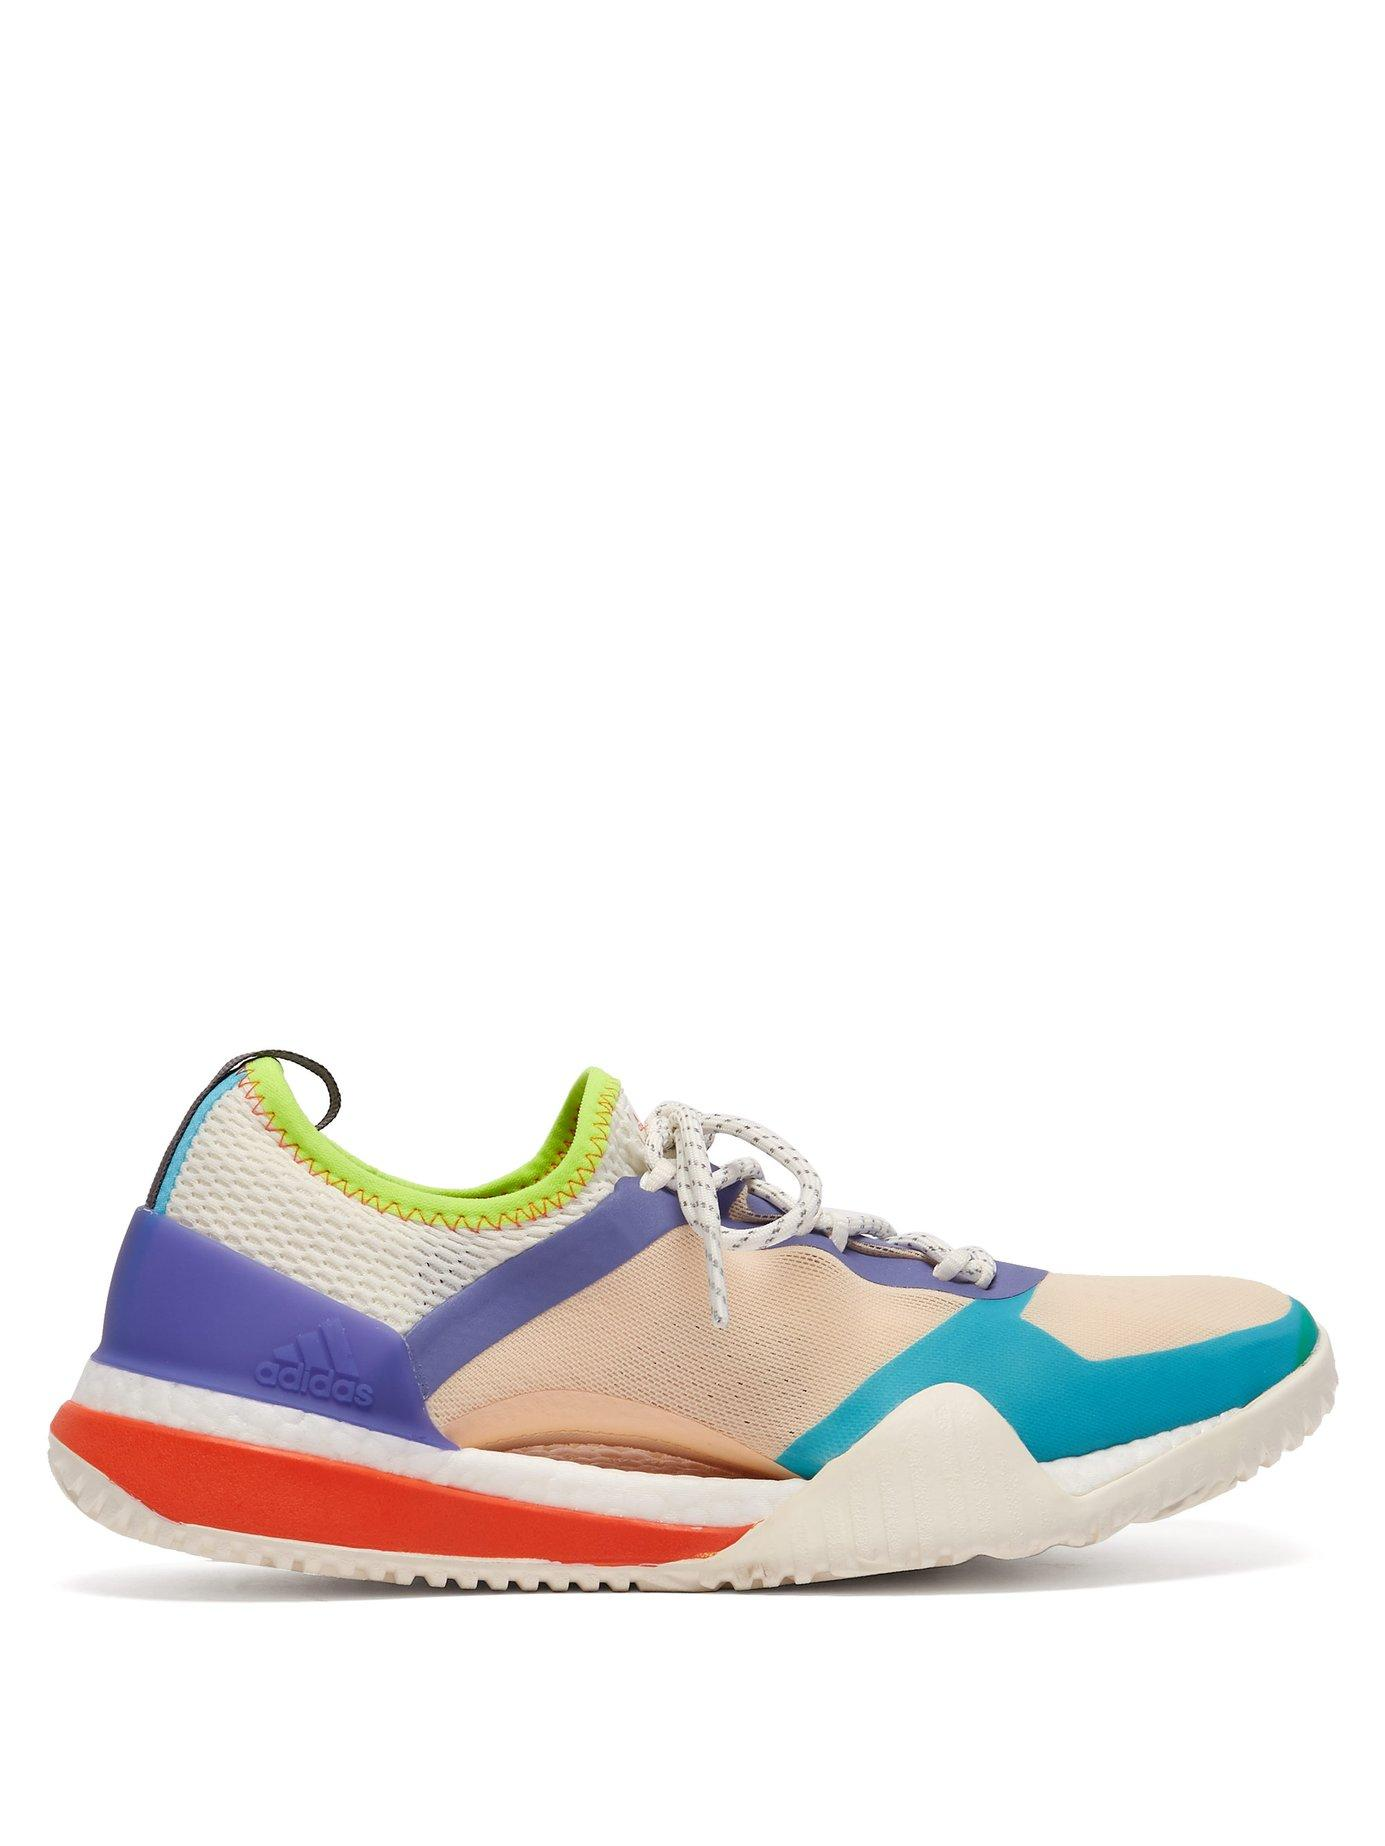 76138ca2cba Lyst - adidas By Stella McCartney Pureboost X Tr 3.0 Low Top Trainers